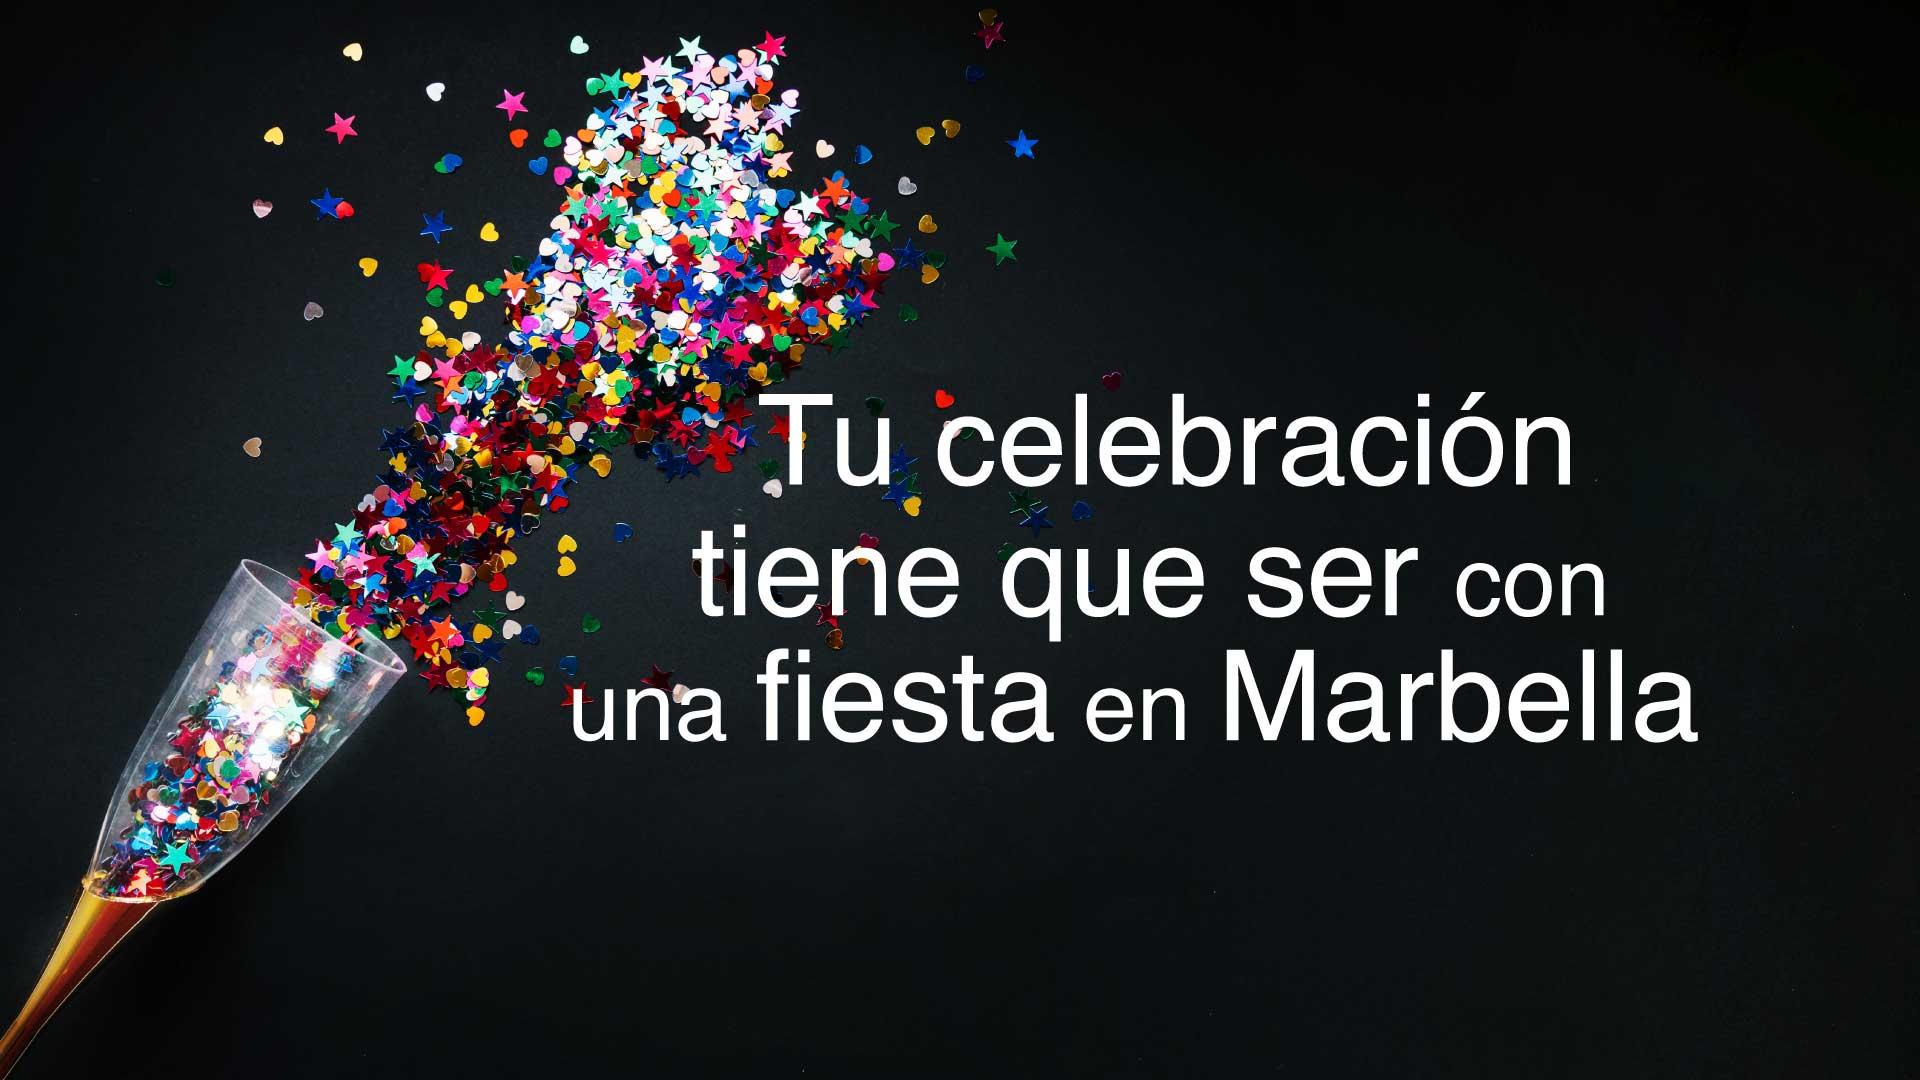 Celebra en Marbella